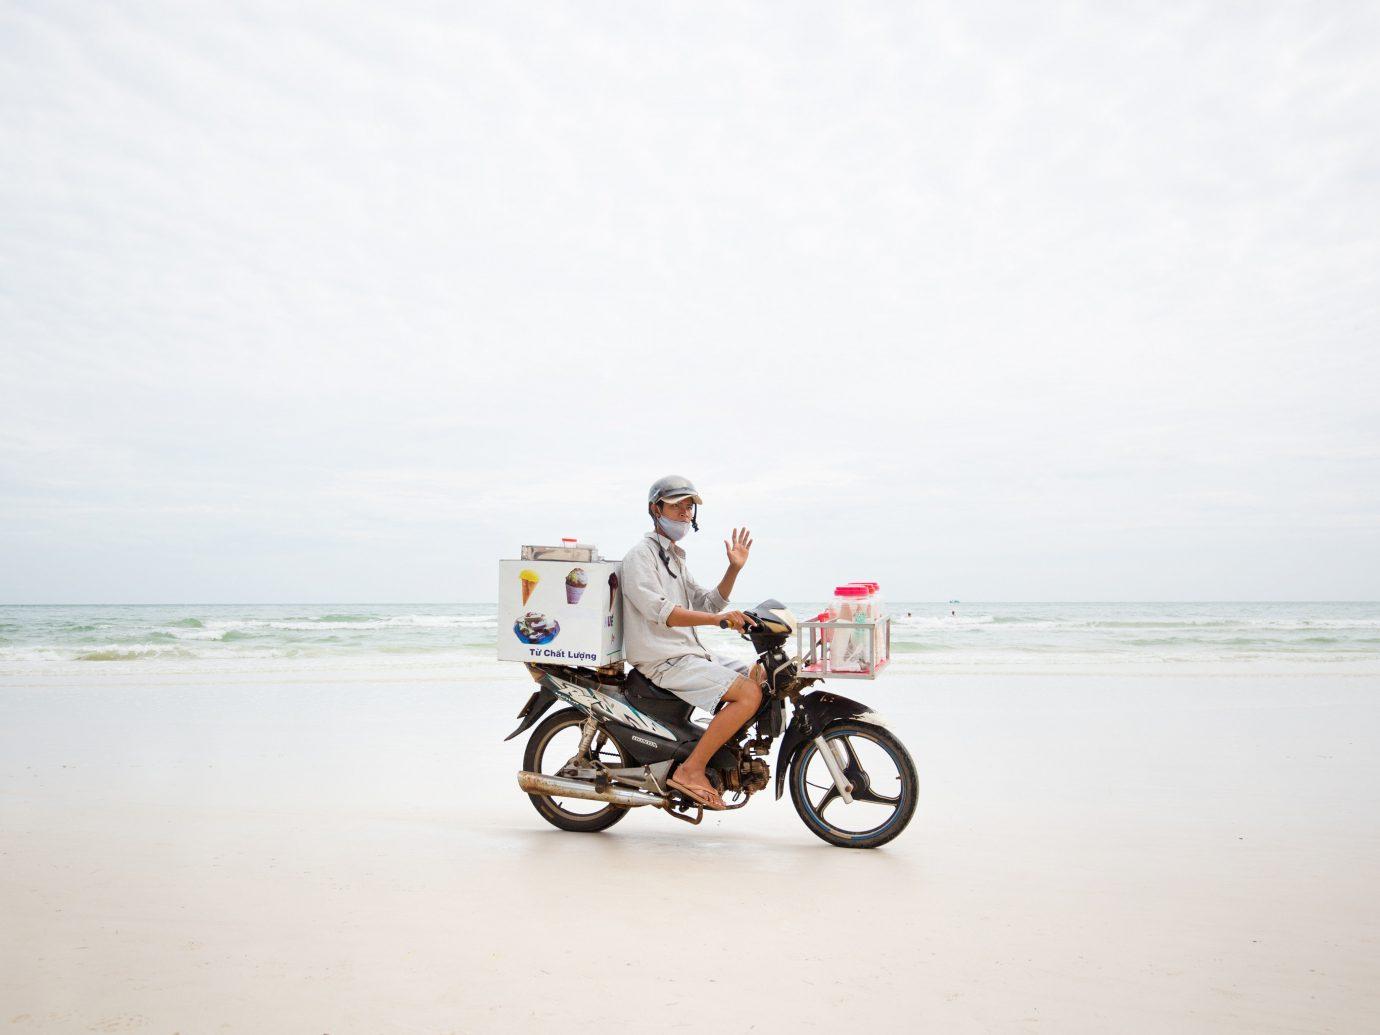 sky outdoor water Beach vehicle Sea Coast sand bicycle motorcycle shore sandy